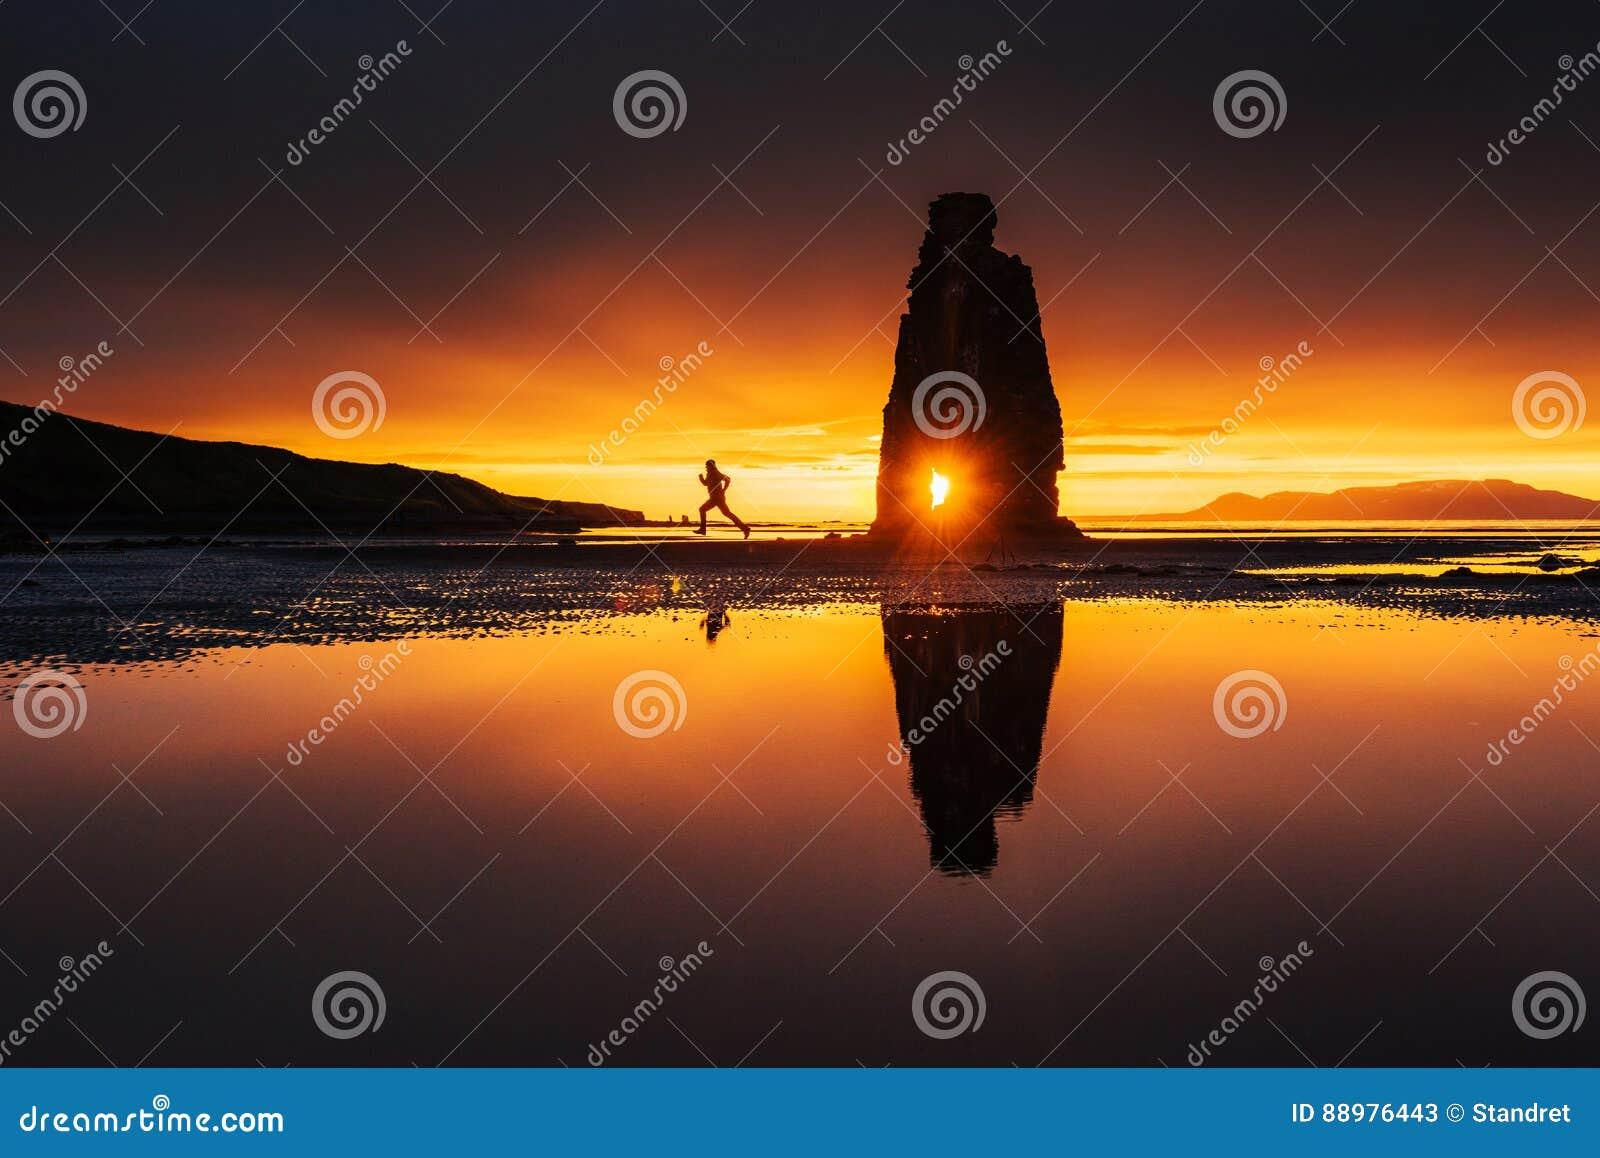 Hvitserkur 15 ύψος μ Είναι ένας θεαματικός βράχος στη θάλασσα στη βόρεια ακτή της Ισλανδίας αυτή η φωτογραφία απεικονίζει στο νερ